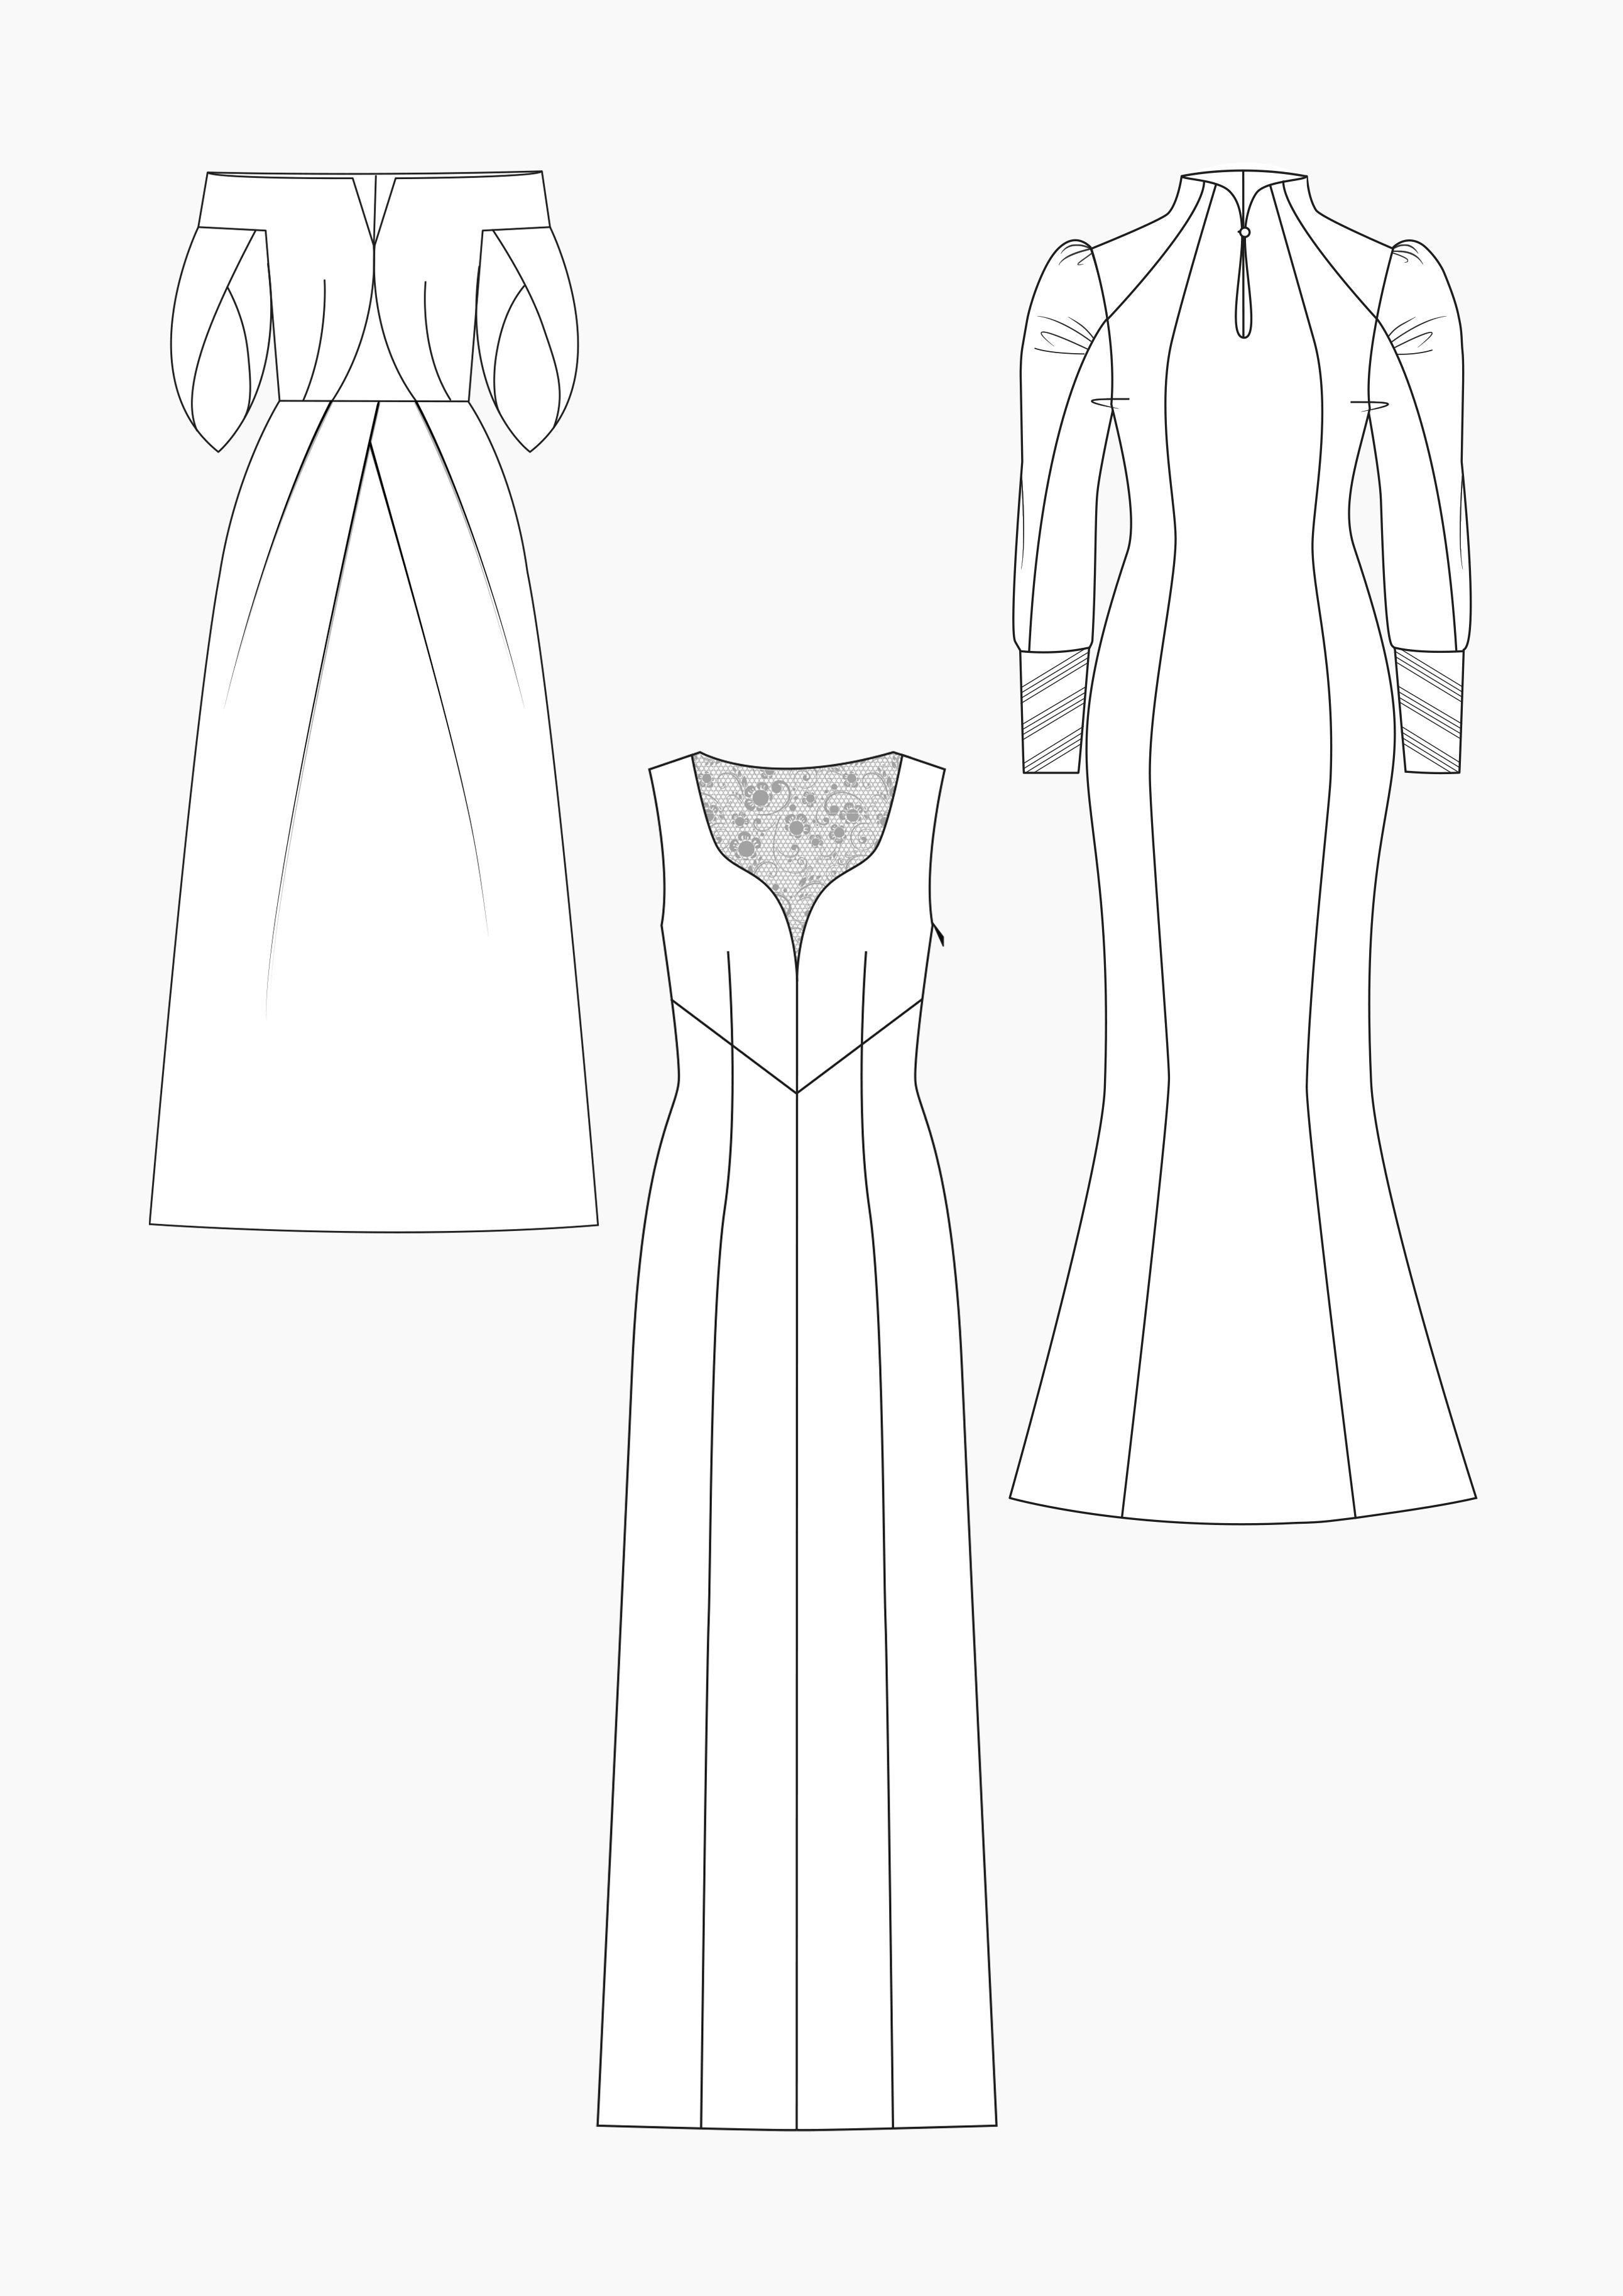 Produkt: Schnitt-Technik Brautkleider 2